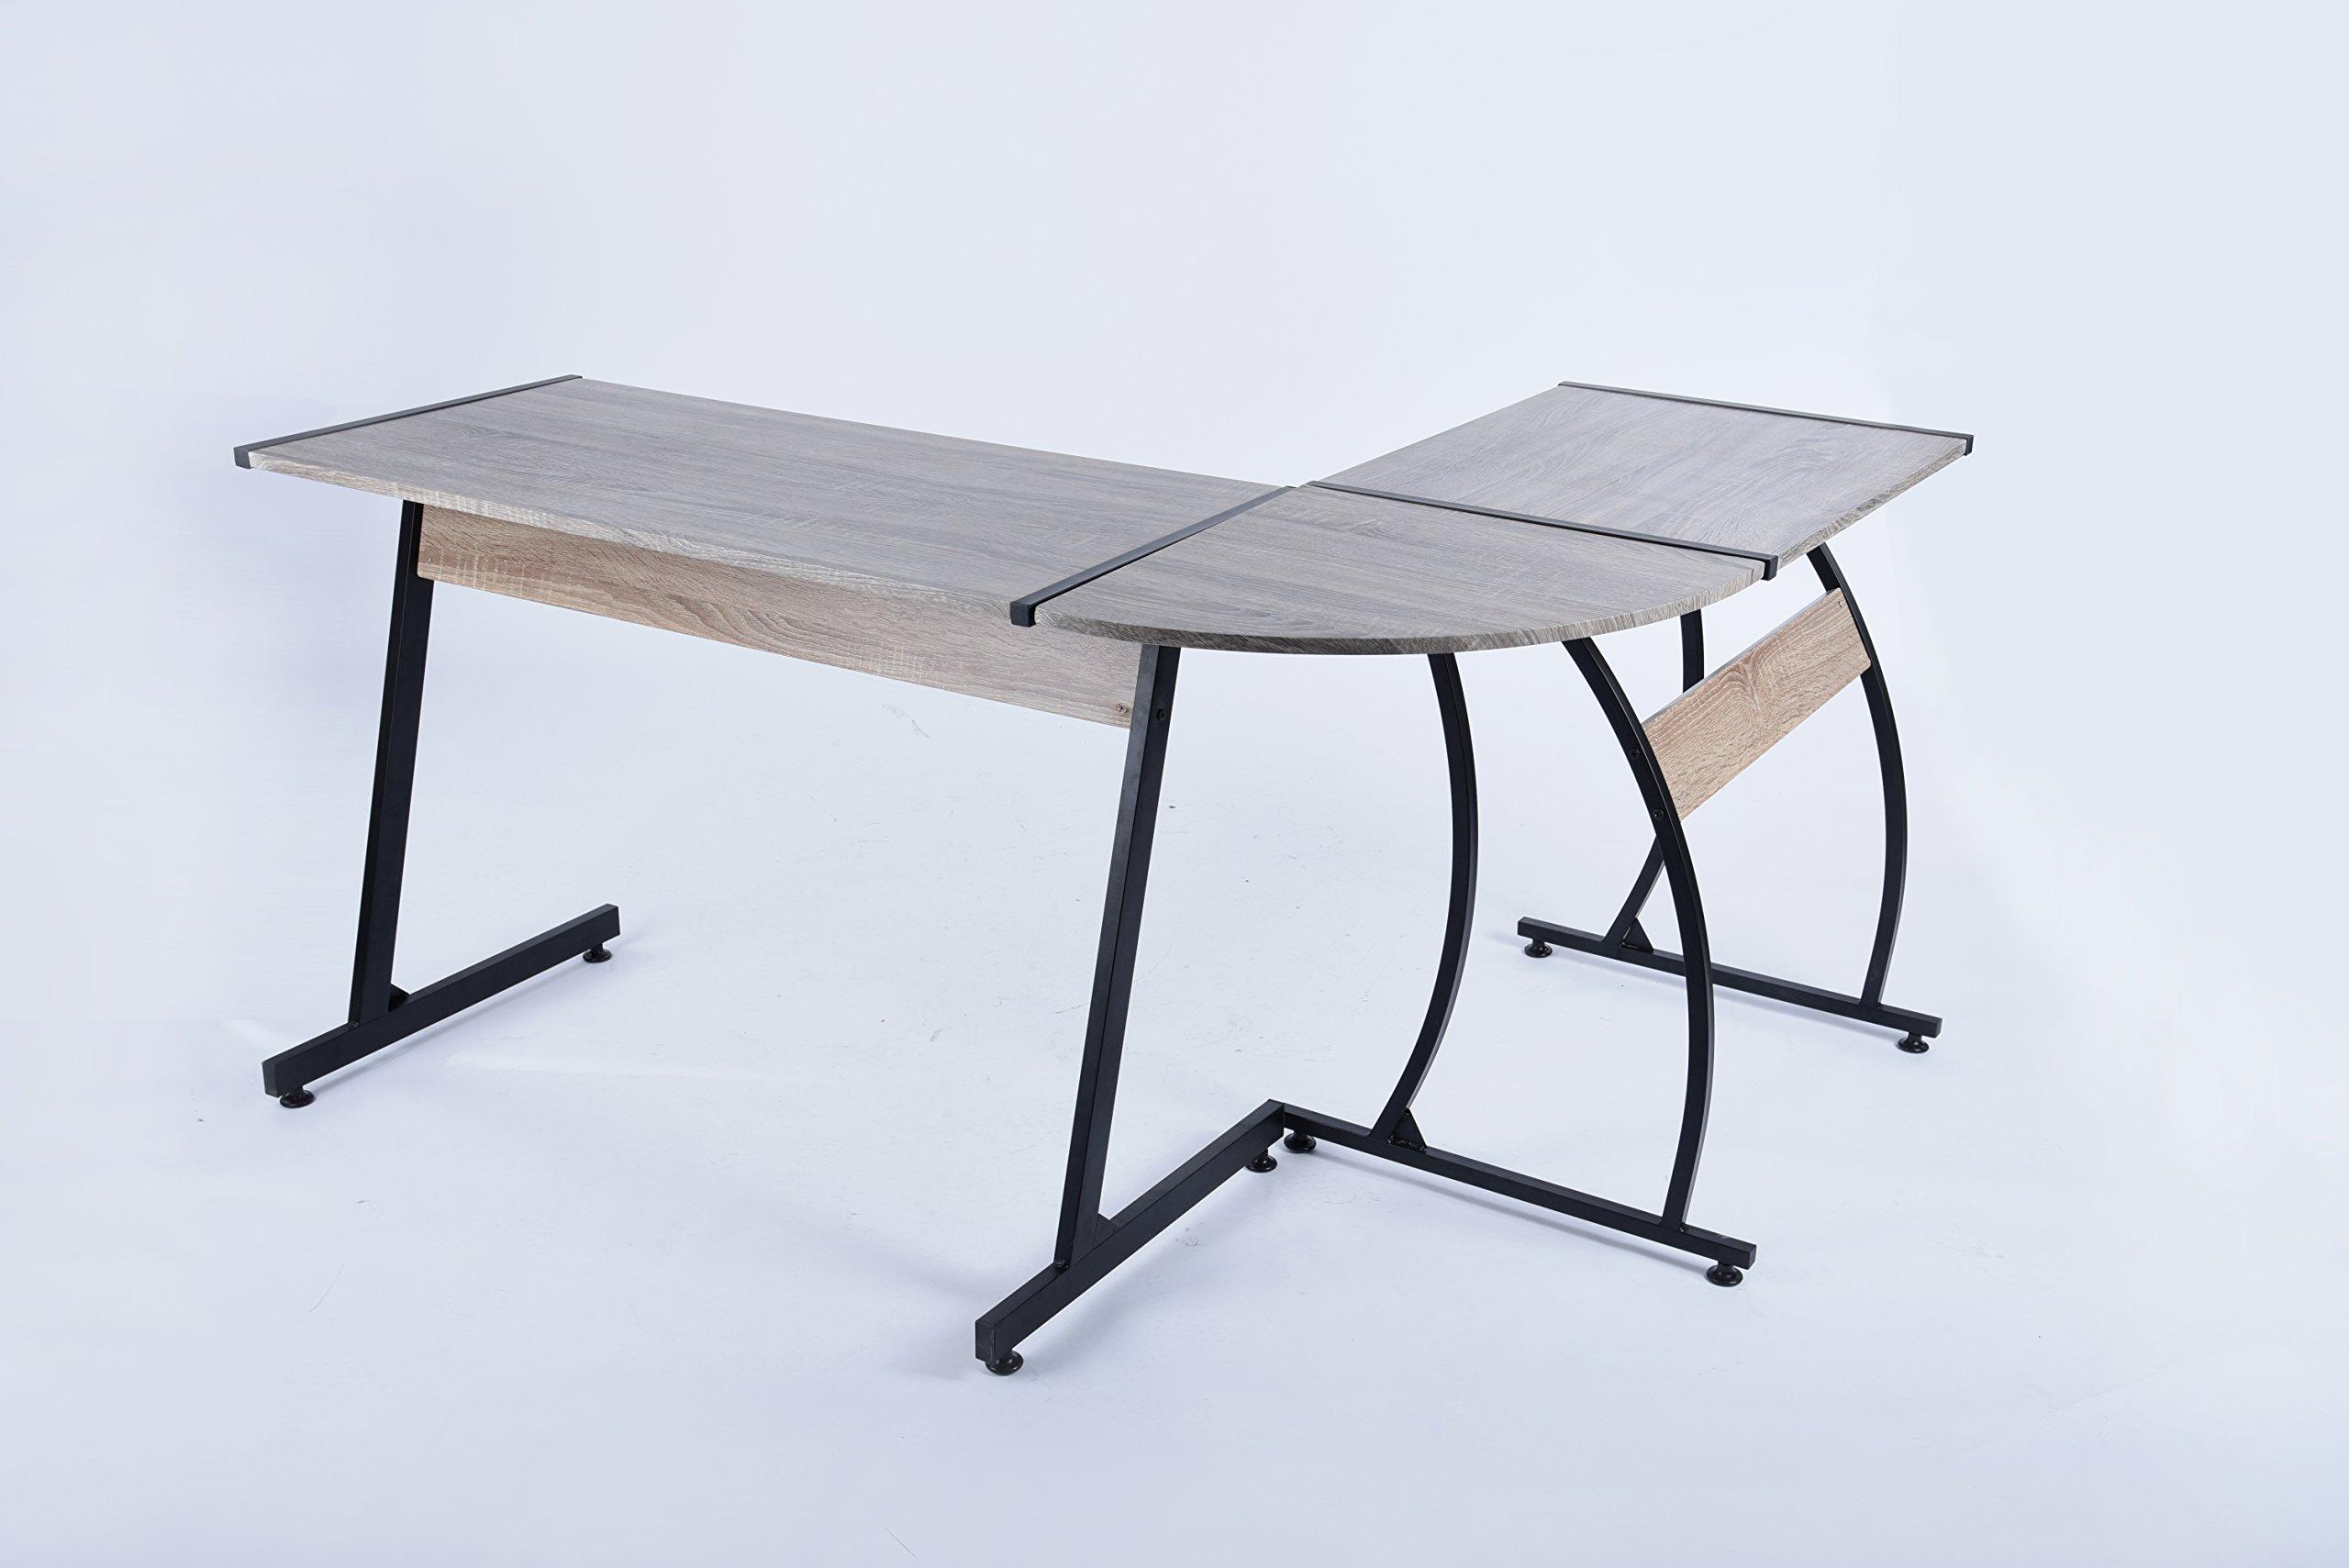 Weathered Dark Grey / Black Finish Metal Wood L-Shape Corner Computer Desk PC Laptop Table Workstation Home Office